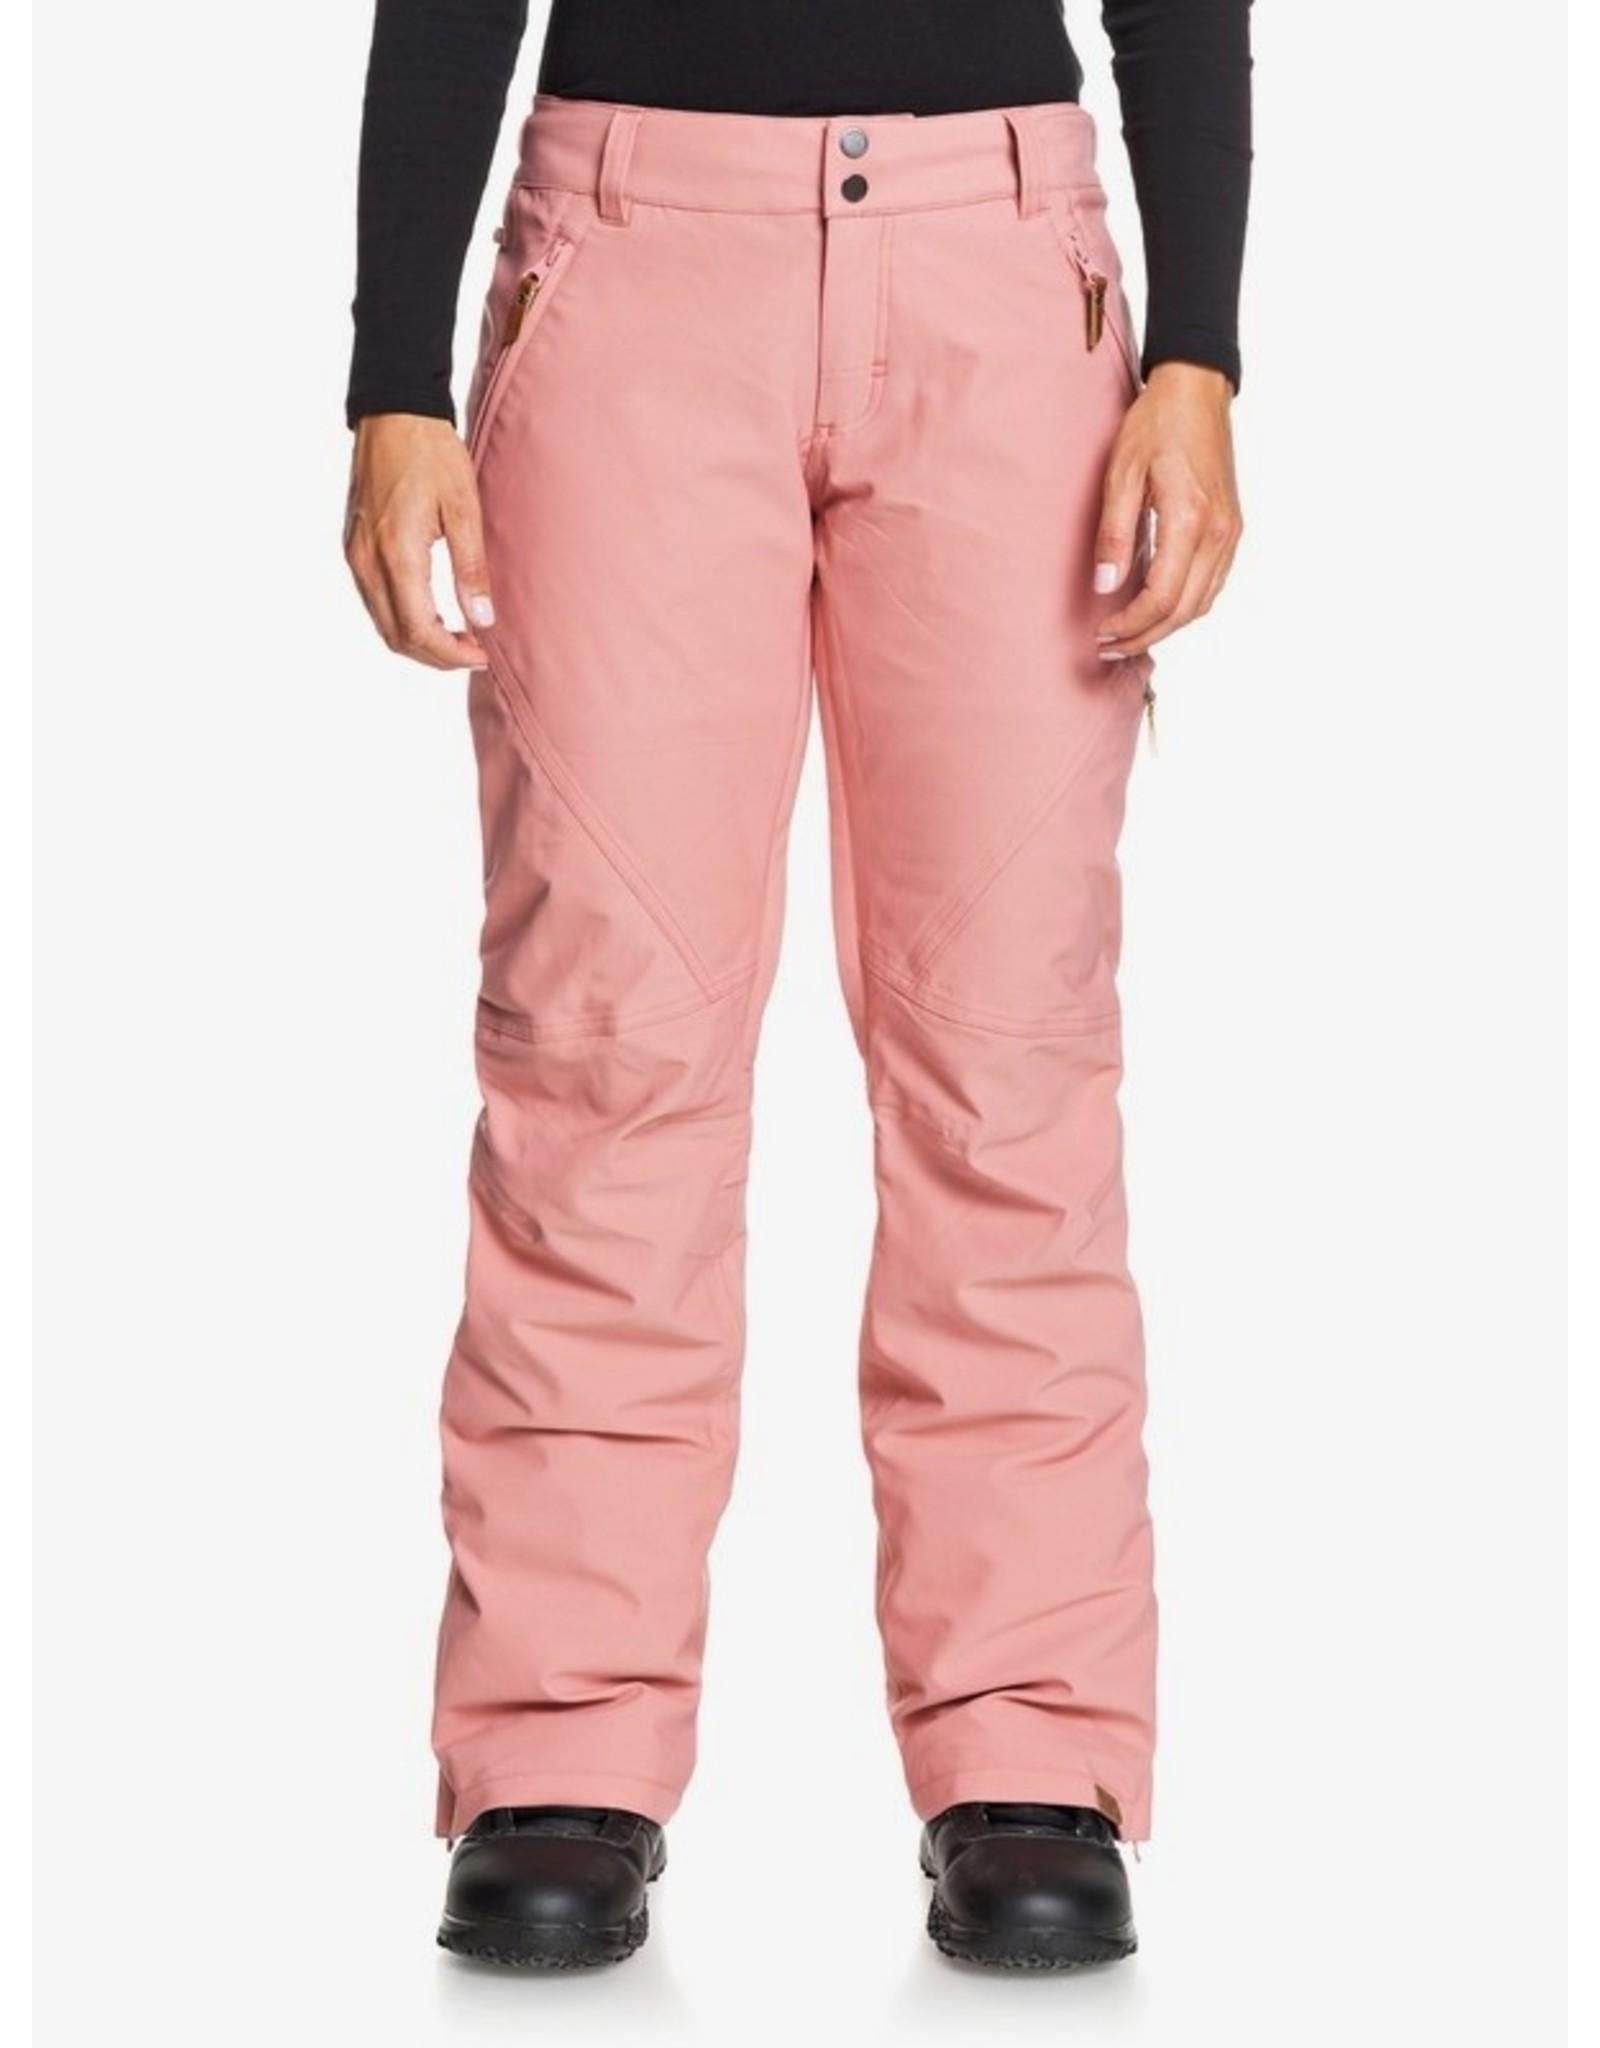 ROXY Cabin Shell Snow Pants